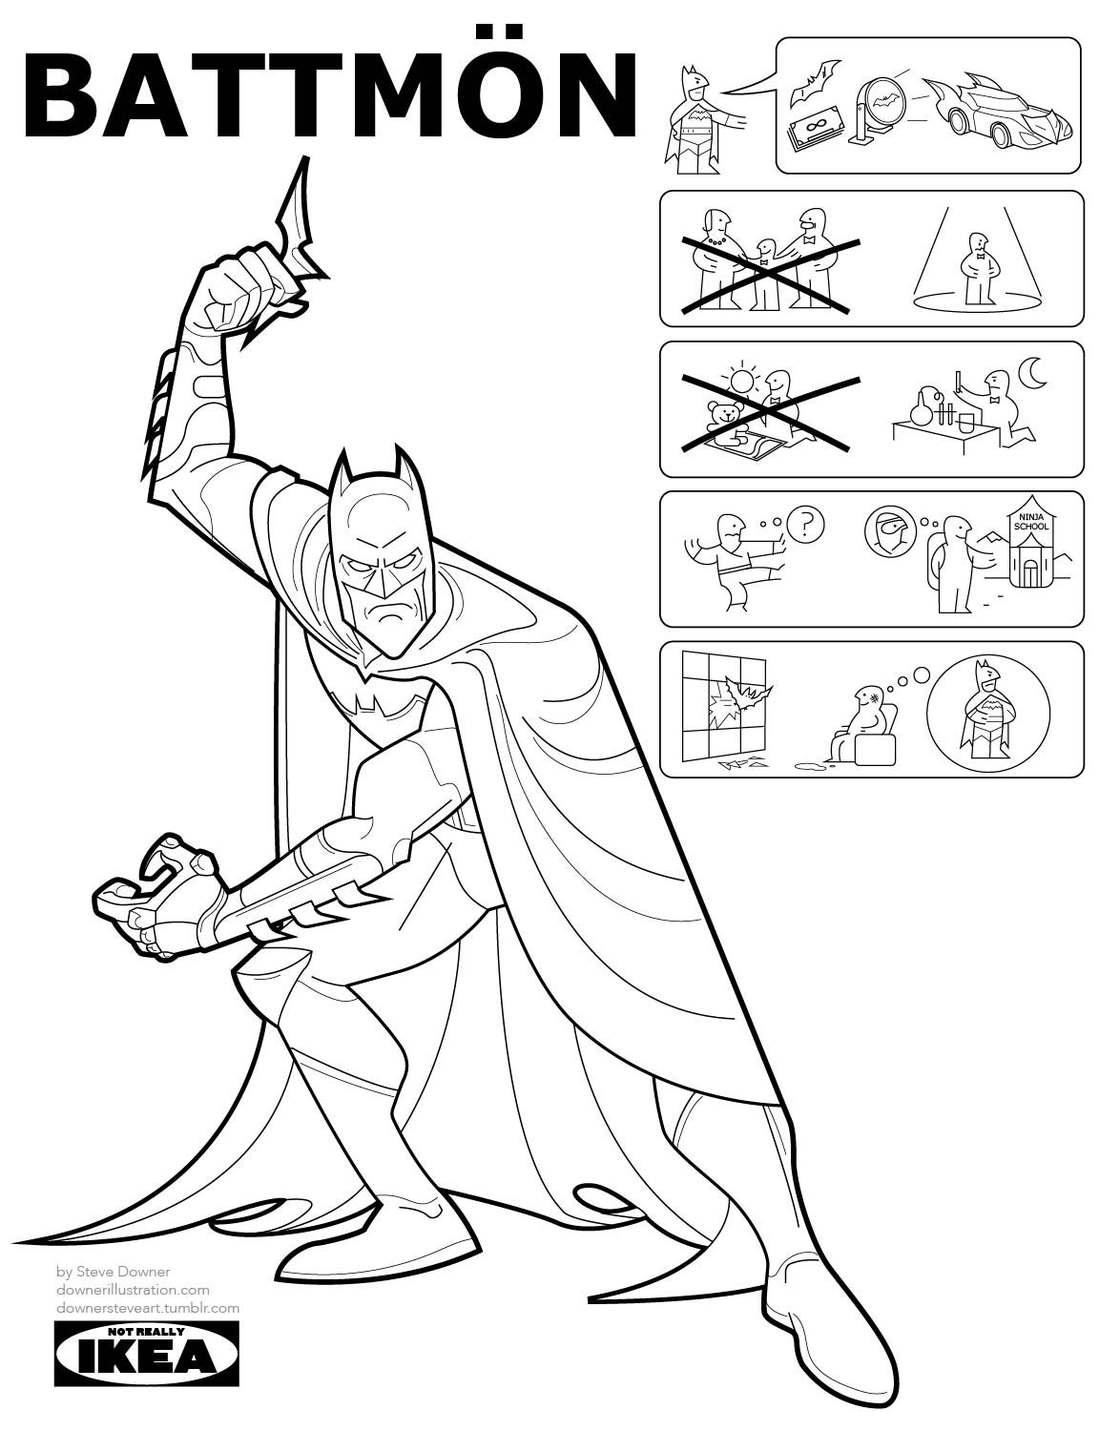 Si IKEA fabriquait des Super-Heros